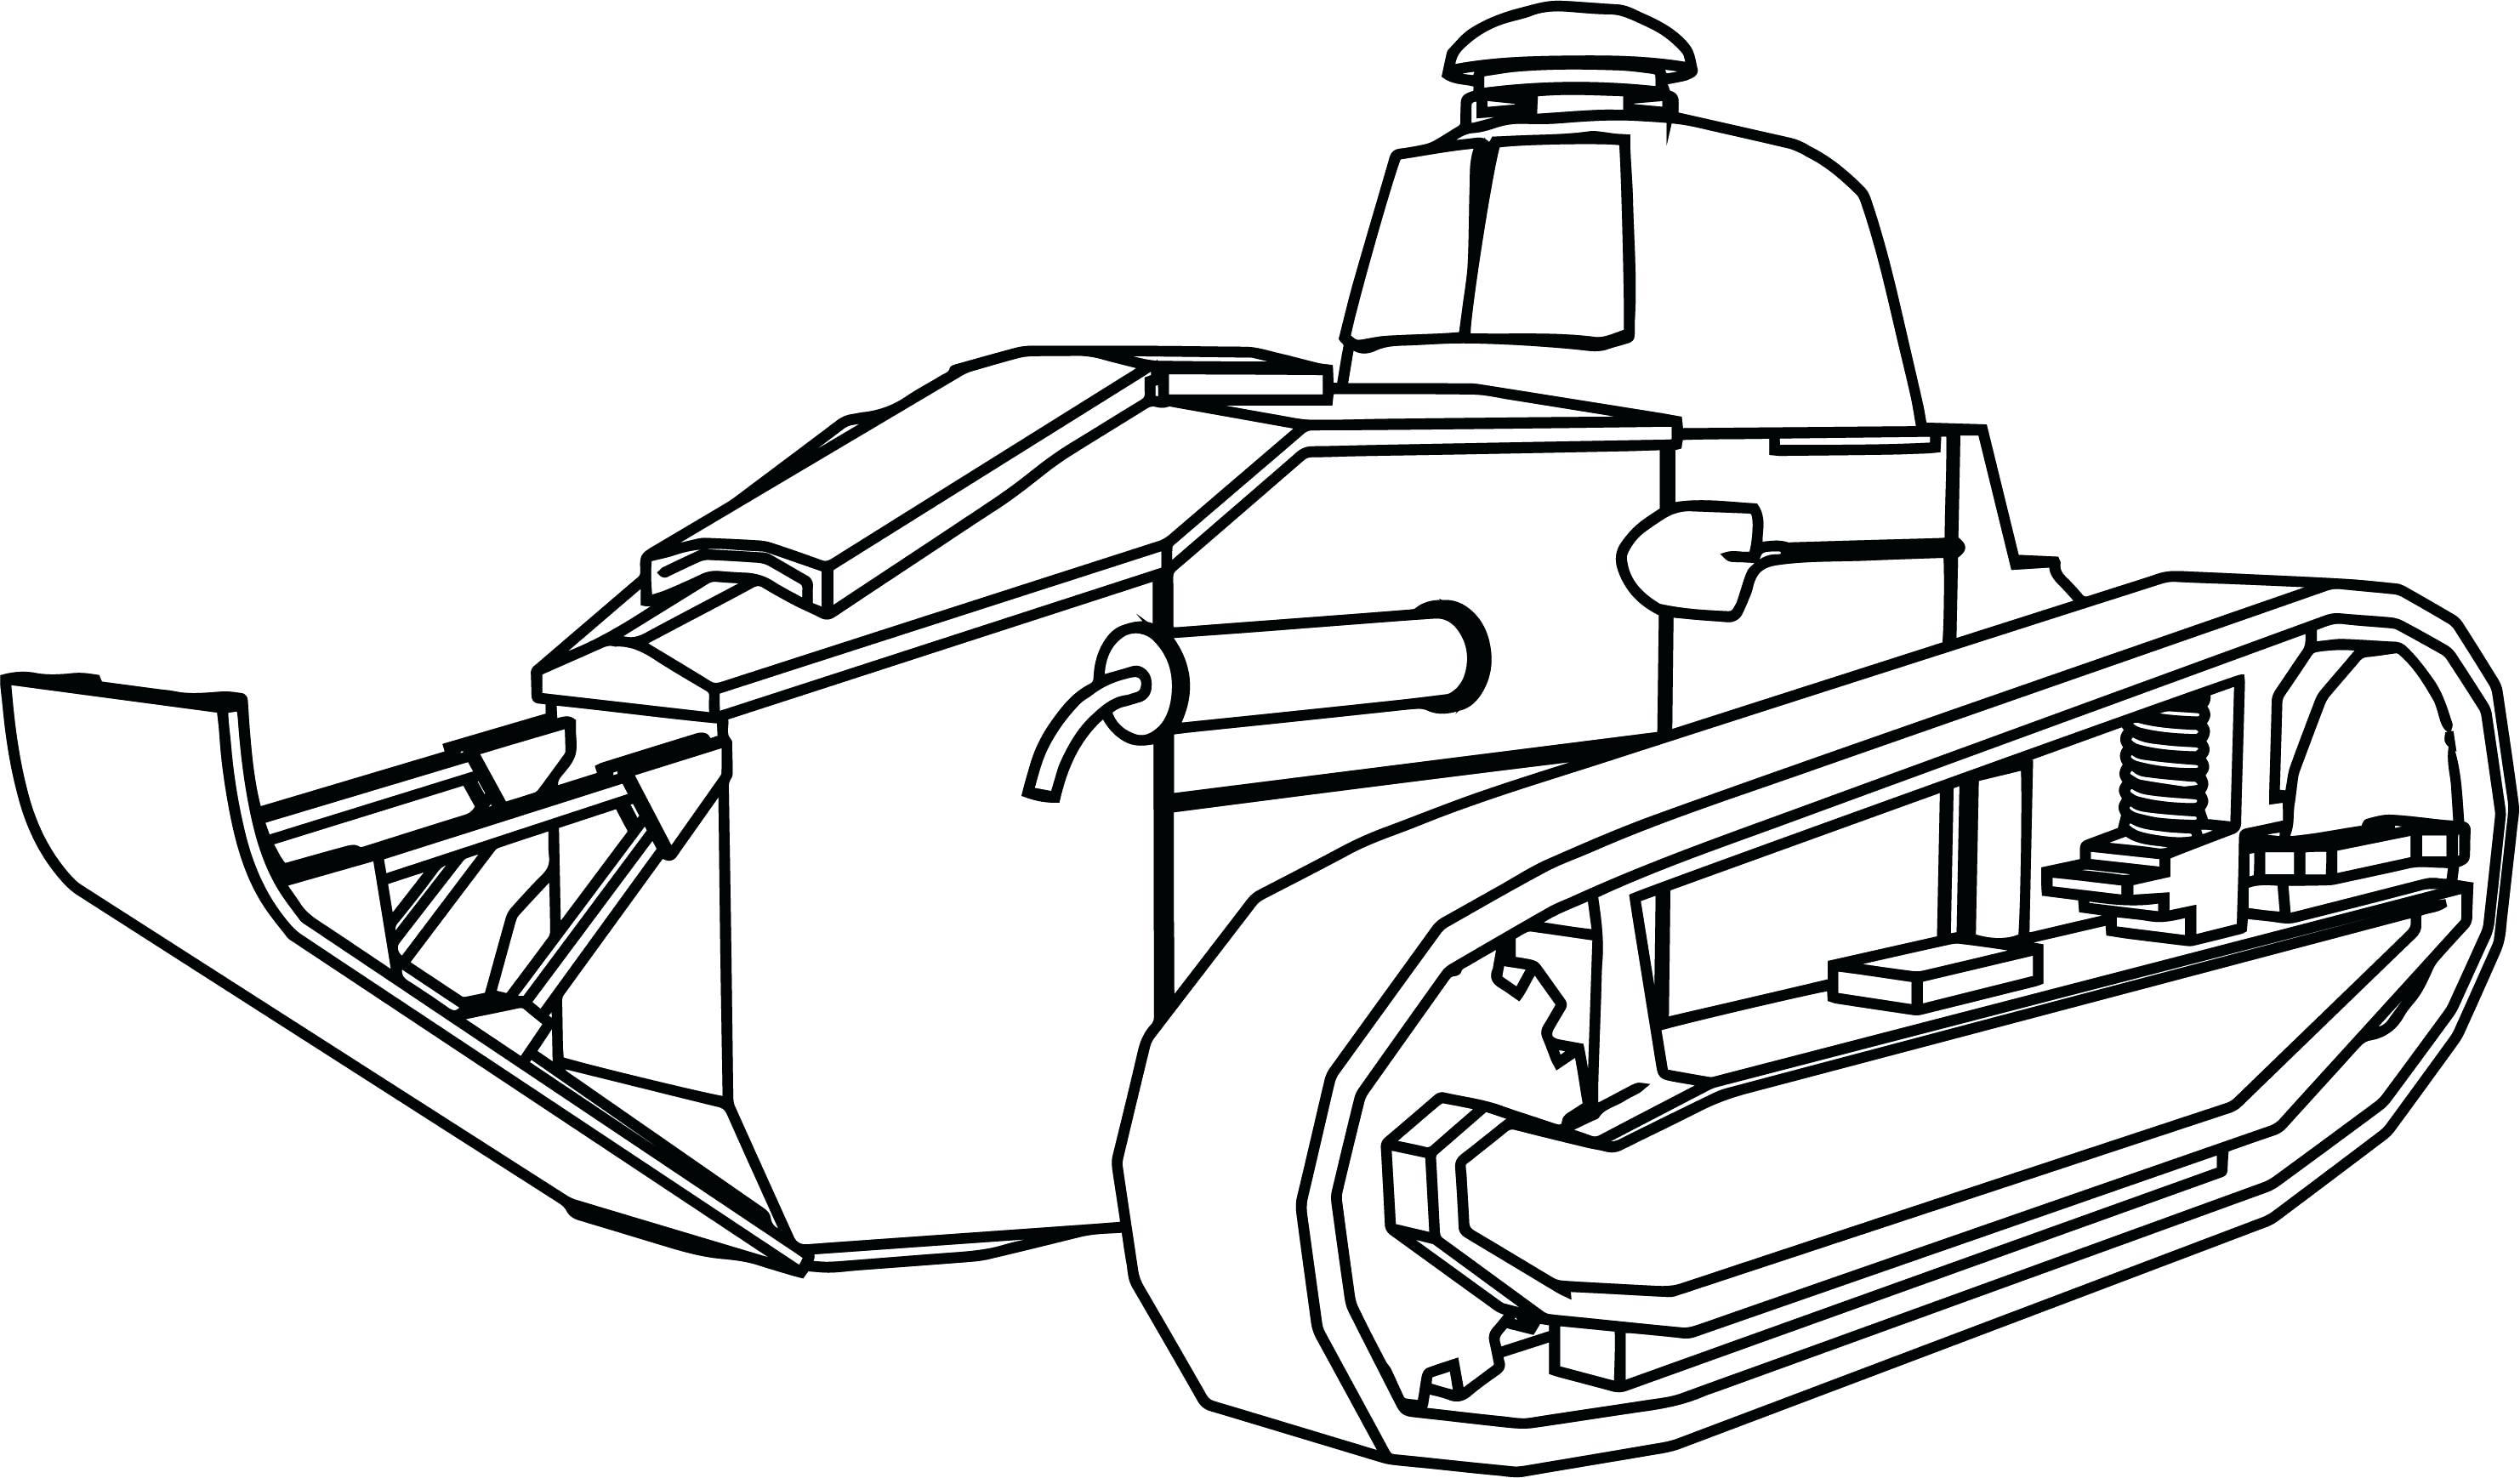 Sherman Tank Drawing At Getdrawings Com